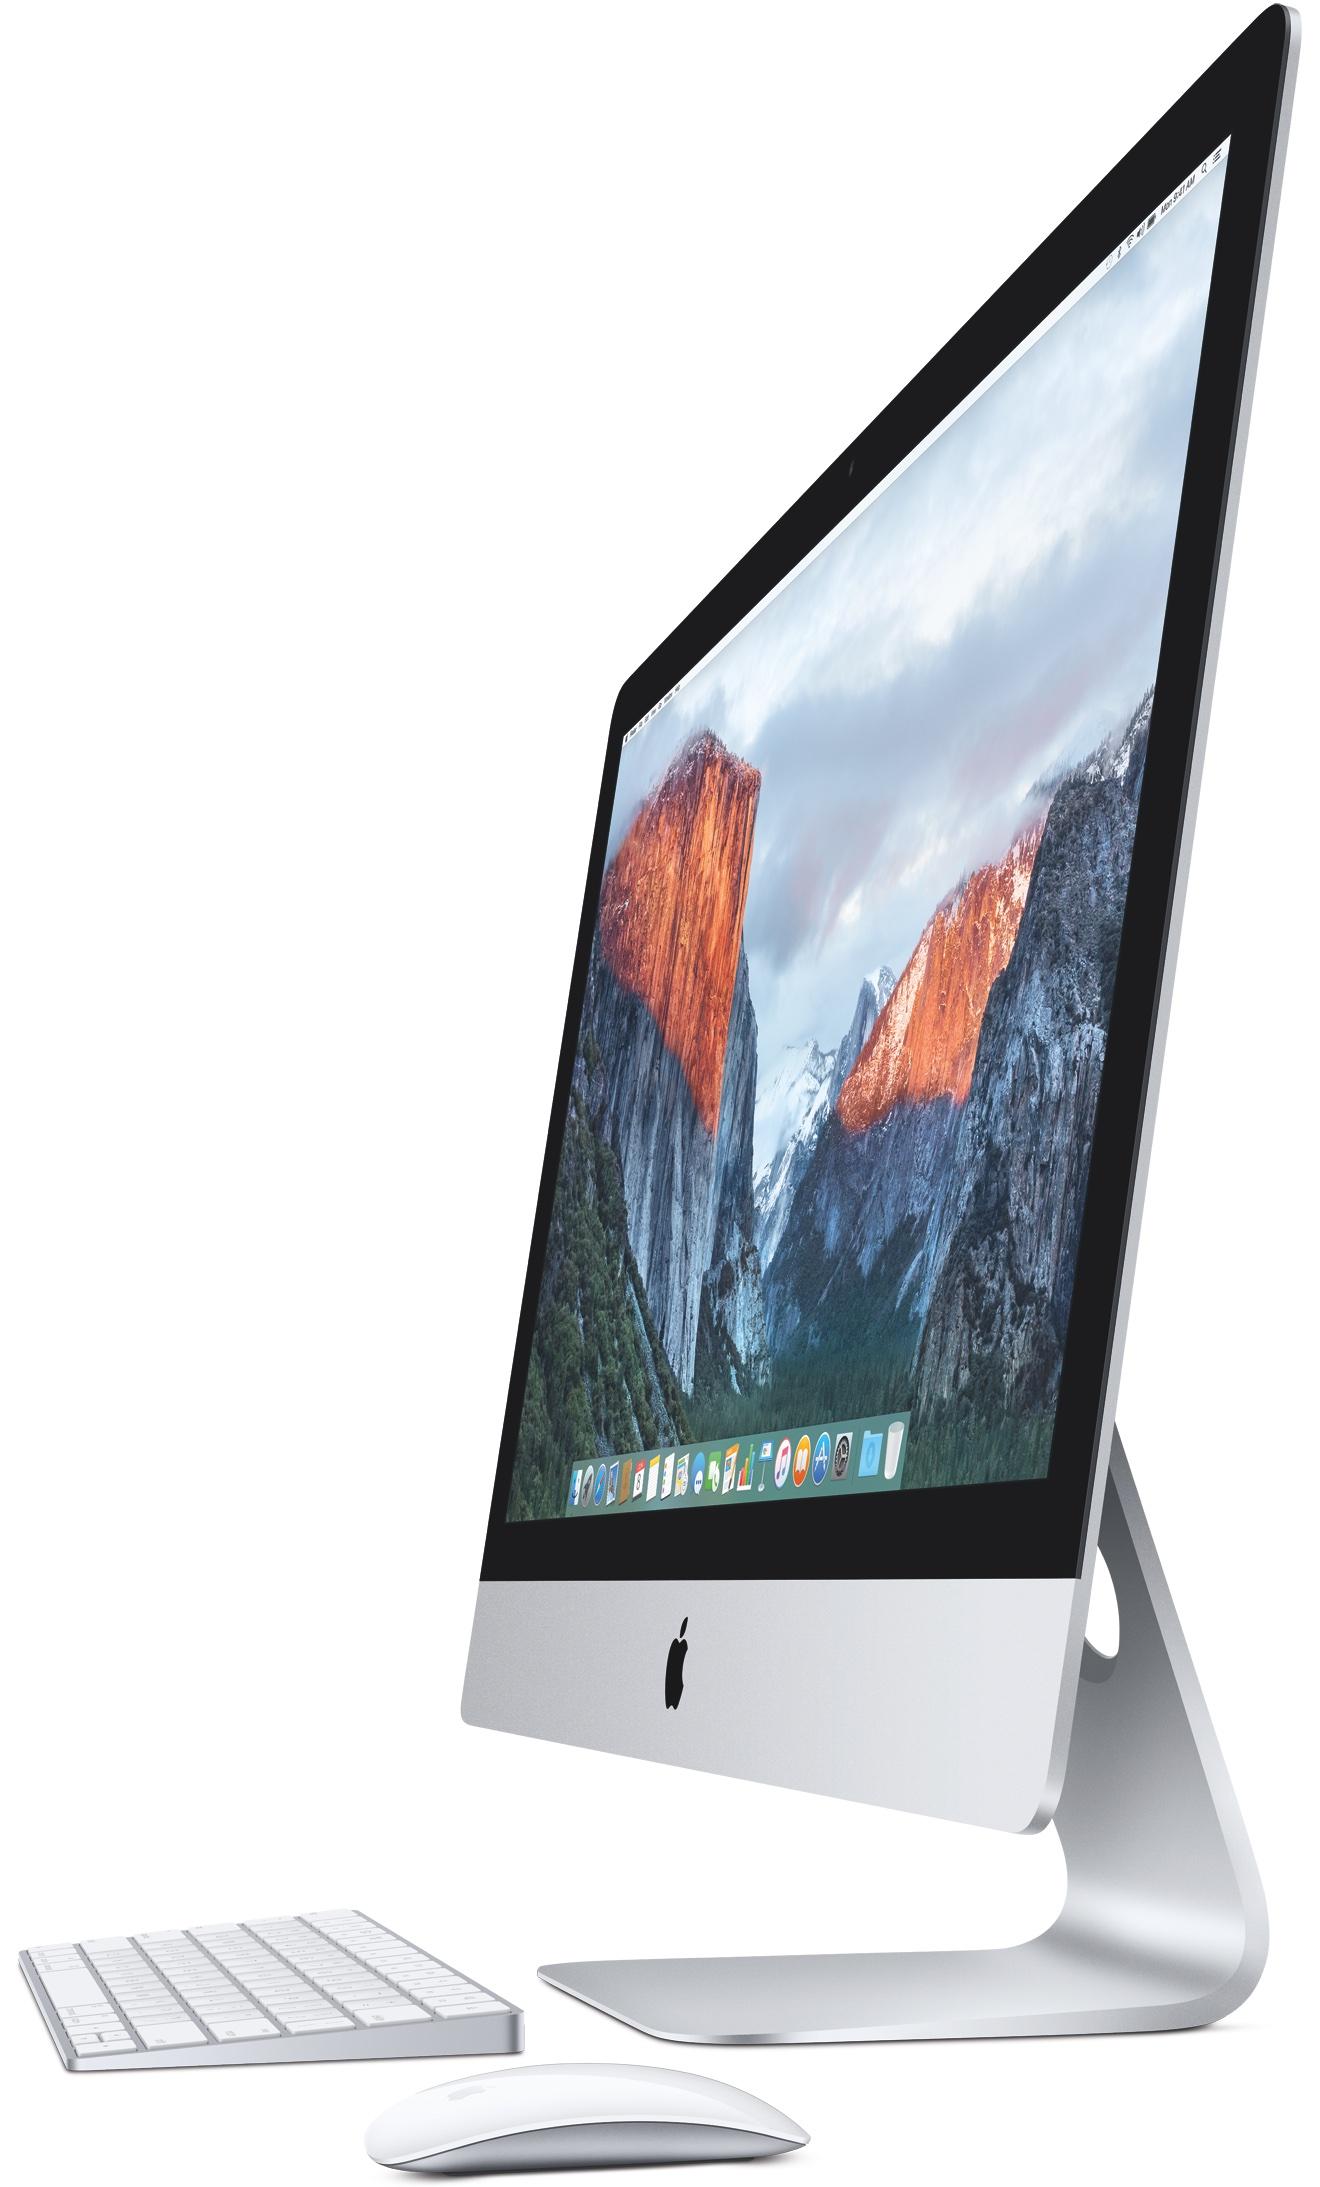 iMac late-2015 27 inch image 001